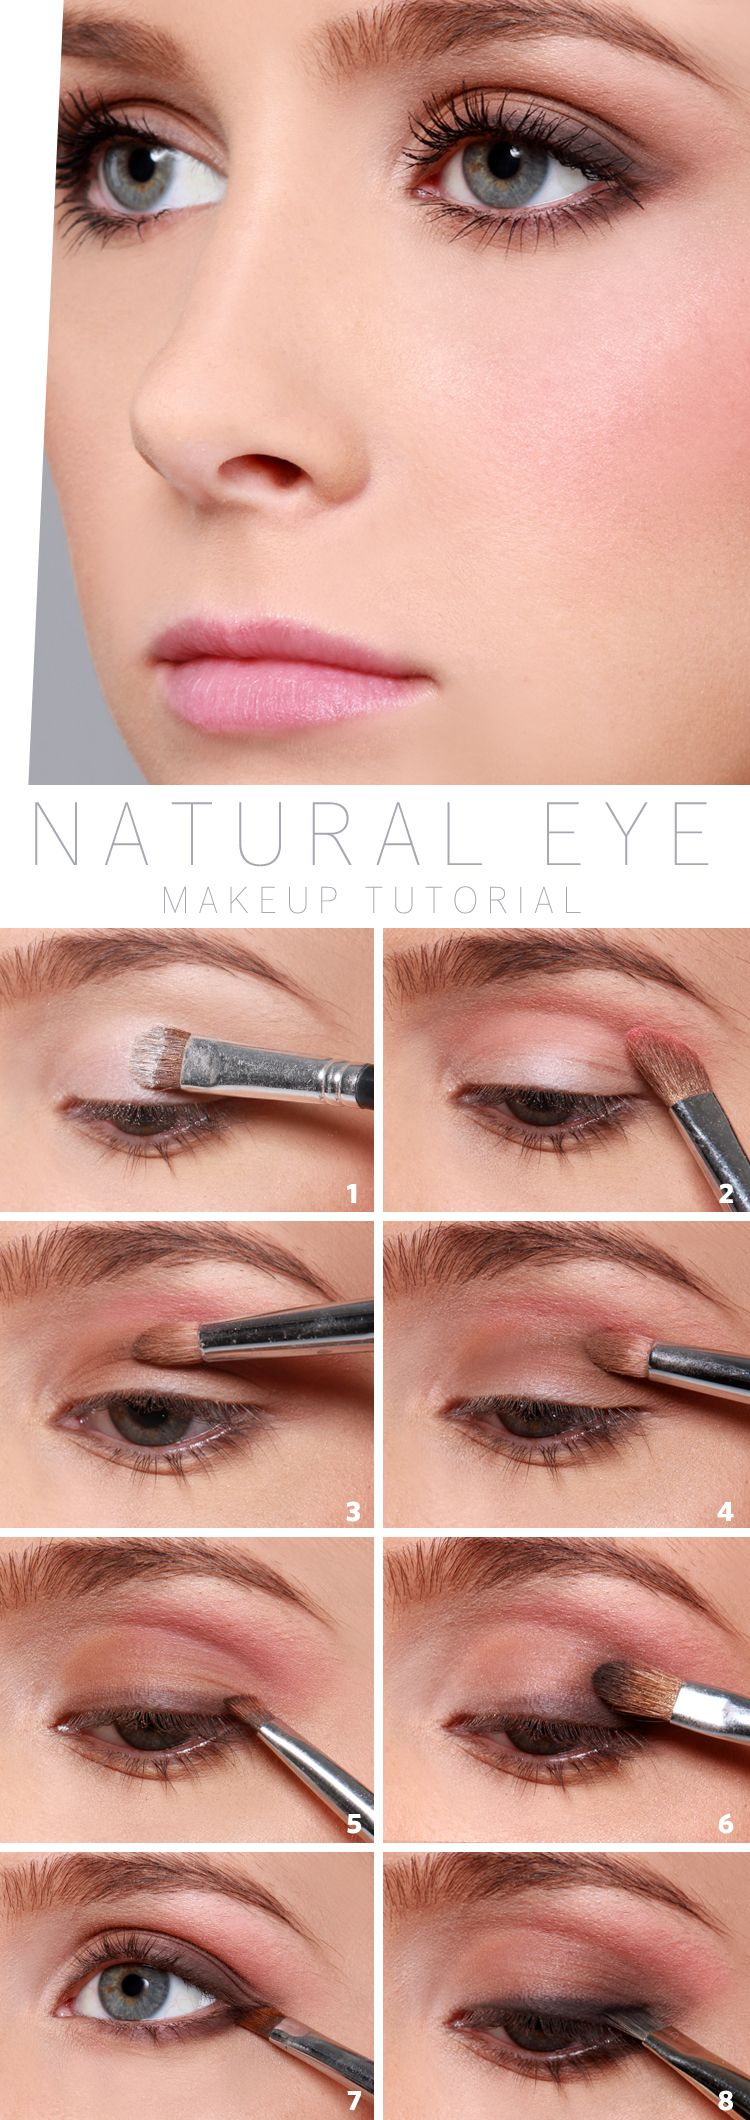 Lulus How To Natural Eye Makeup Tutorial Beauty Board Pinterest